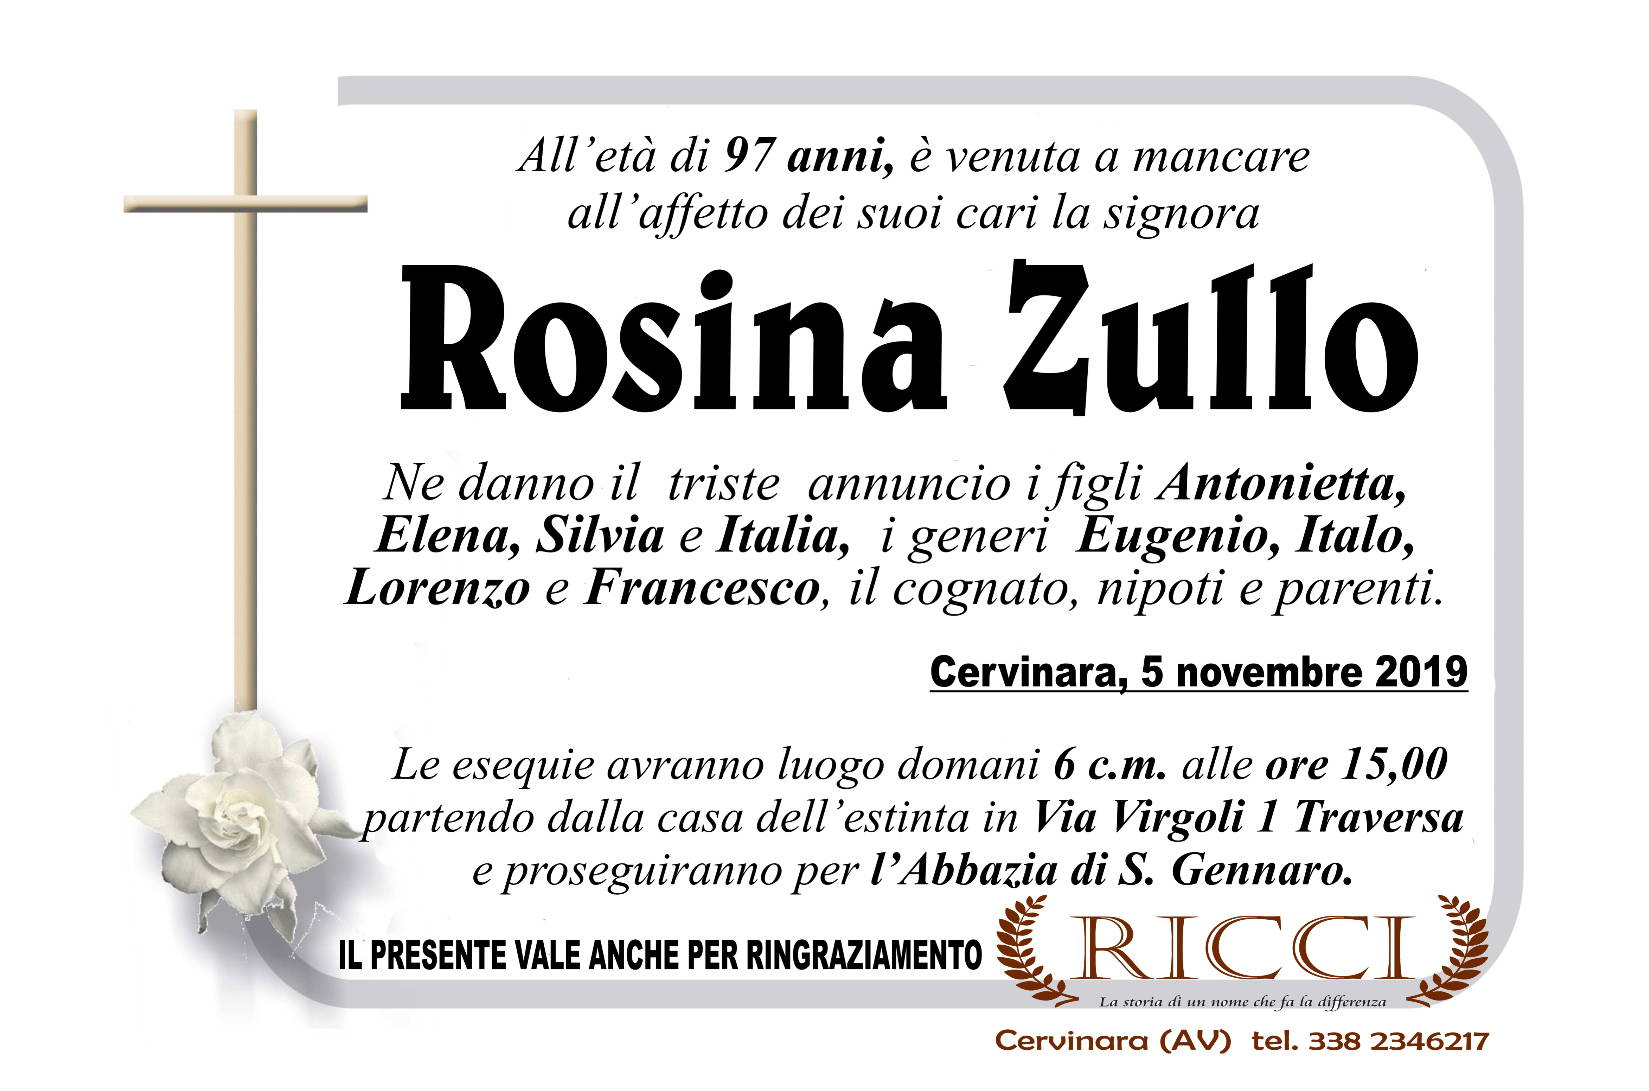 Rosina Zullo